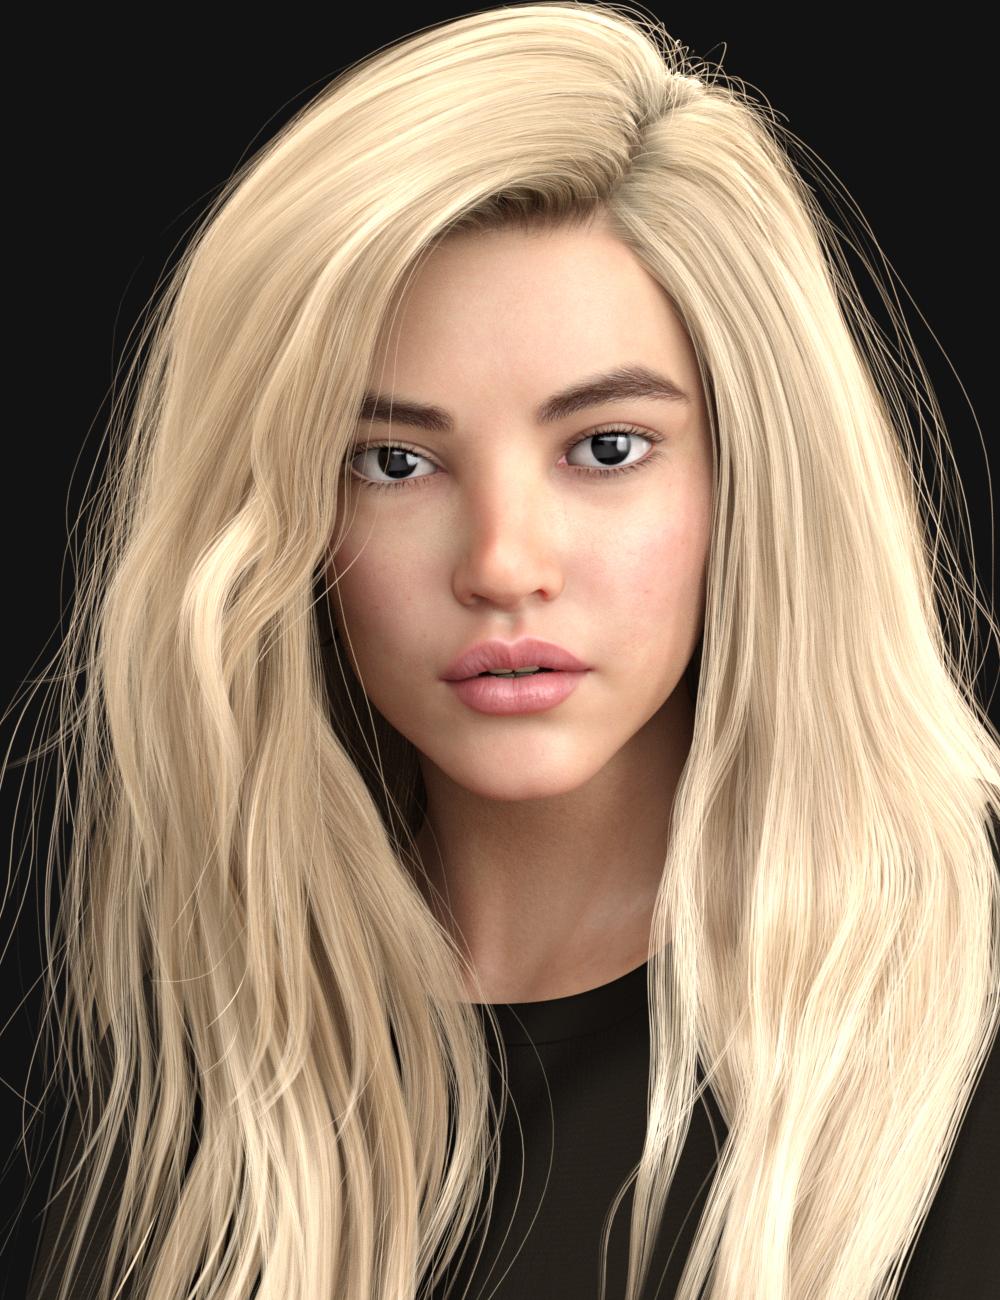 Medea HD for Genesis 8 Female by: Mousso, 3D Models by Daz 3D